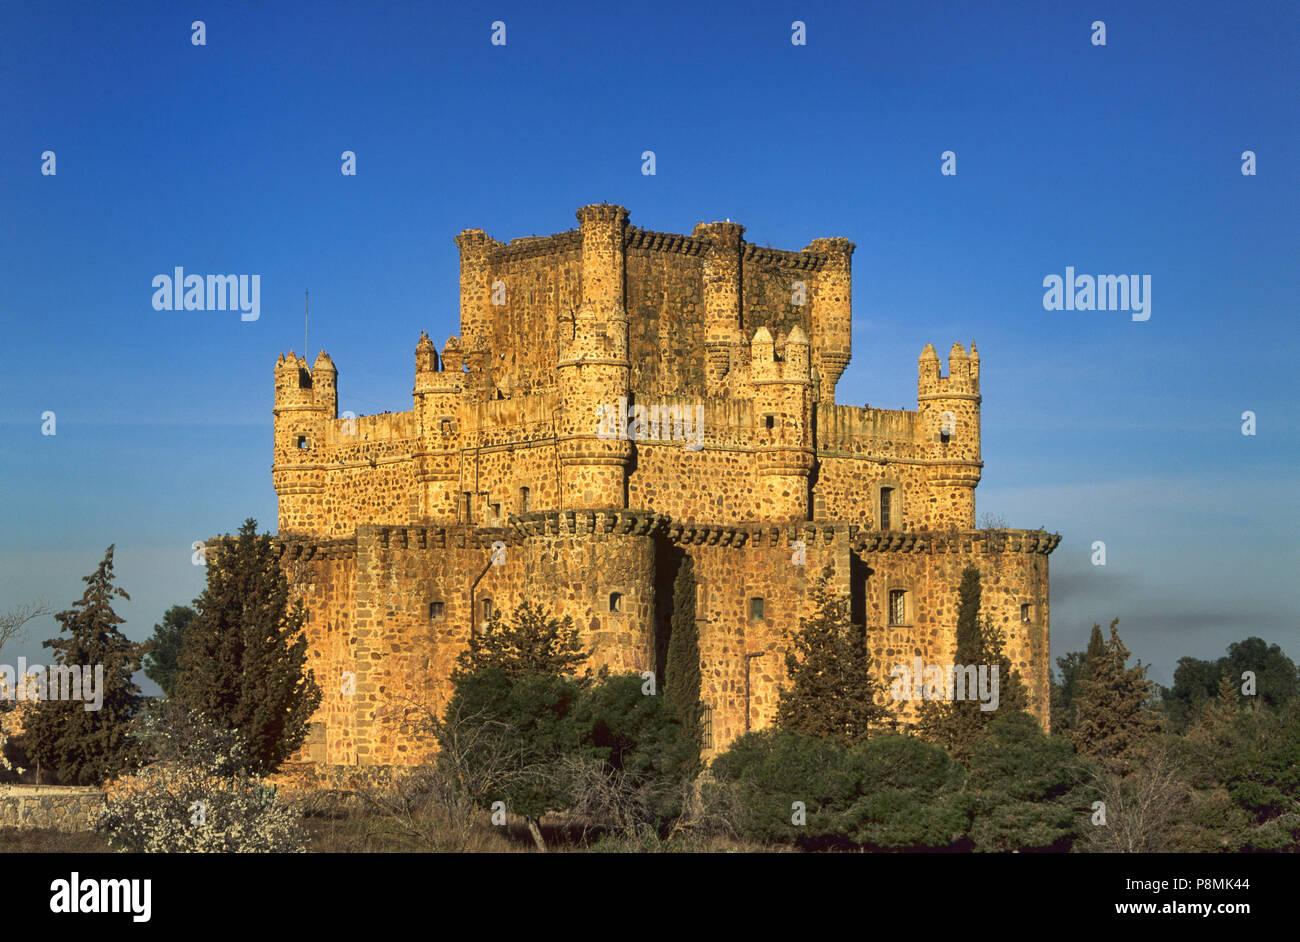 Castle of Lopez de Ayala family, counts of Fuensalida, in Guadamur, province of Toledo, Castile-La Mancha, Spain - Stock Image